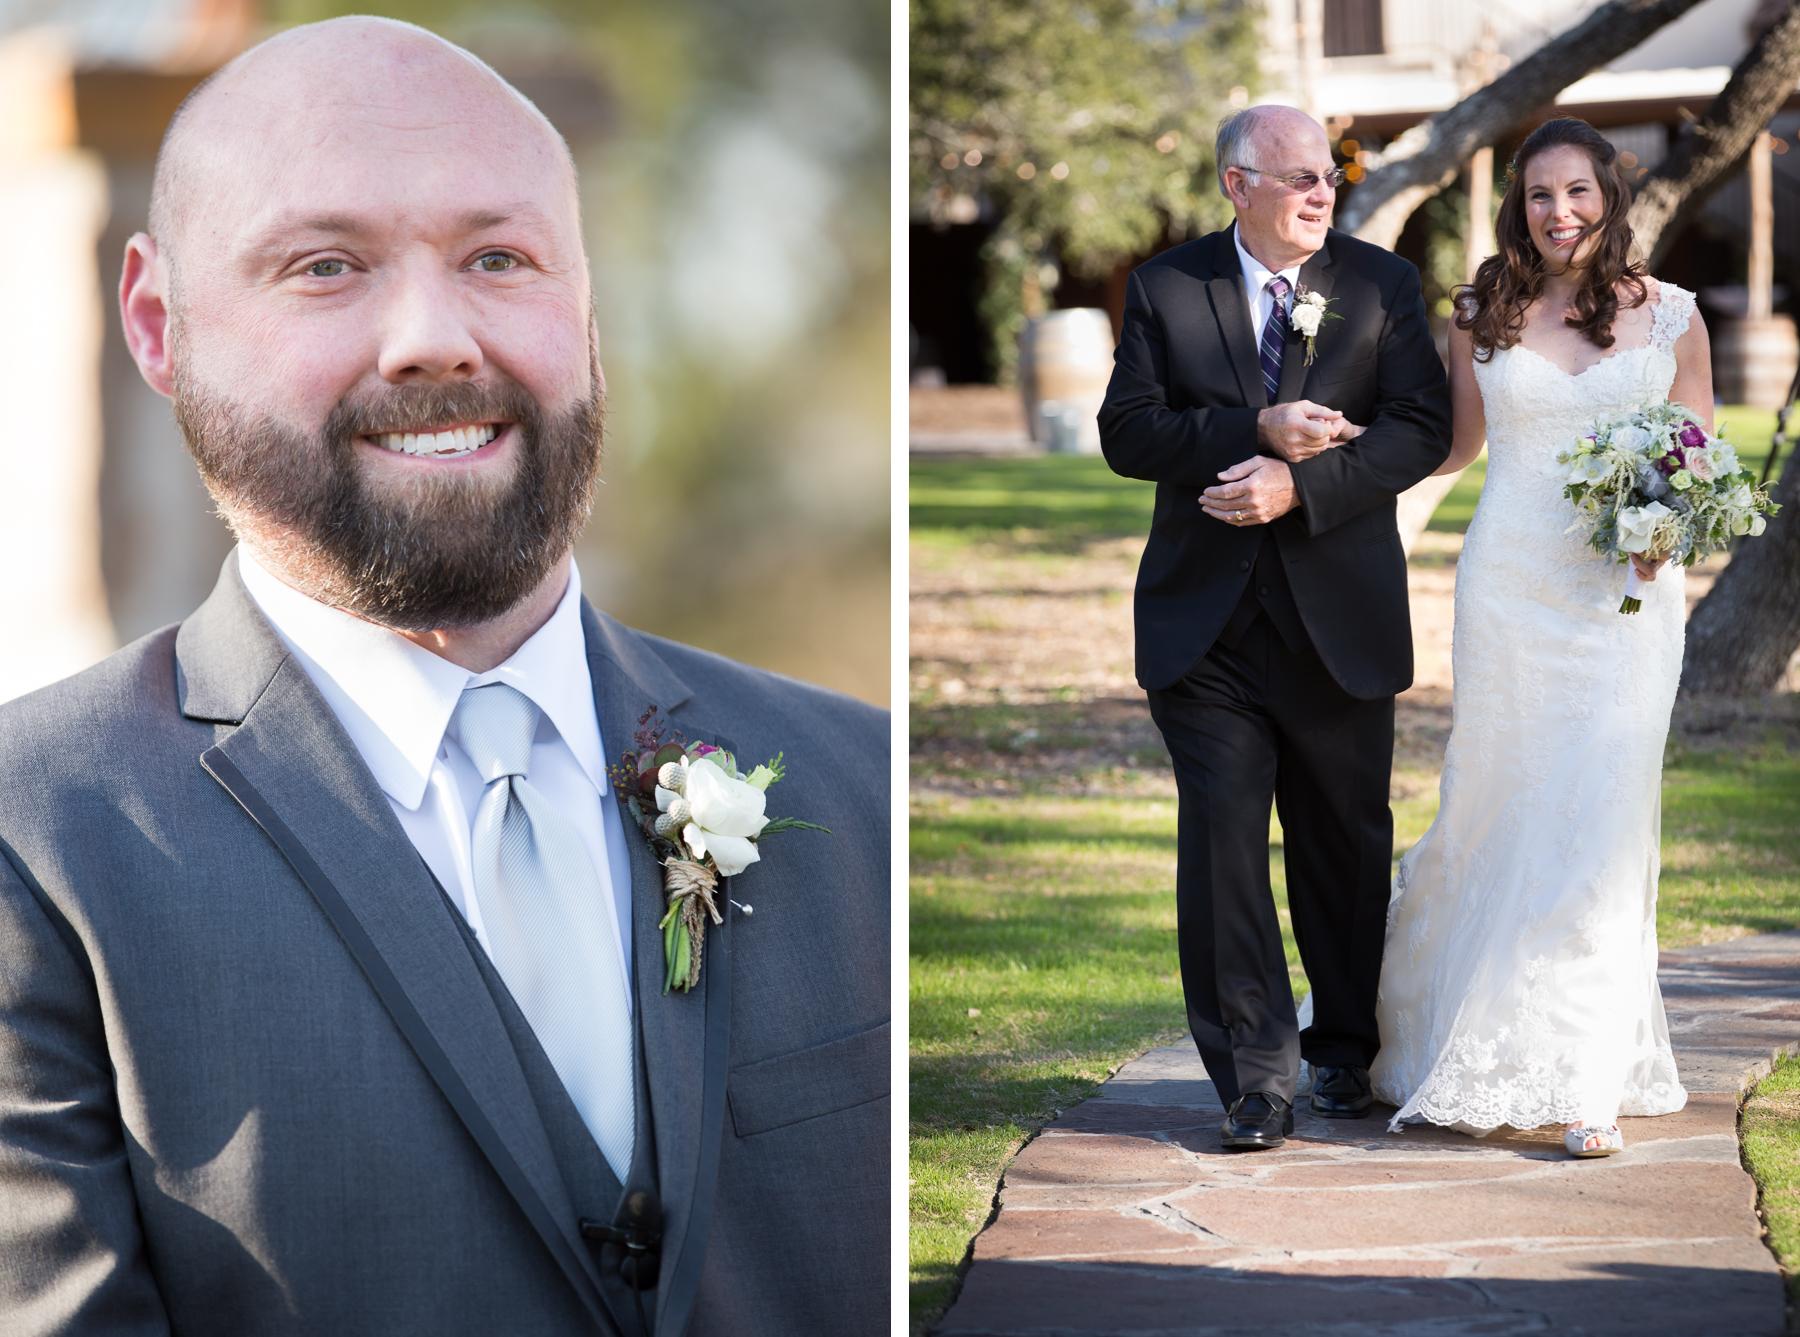 wedding-photography-austin.jpg